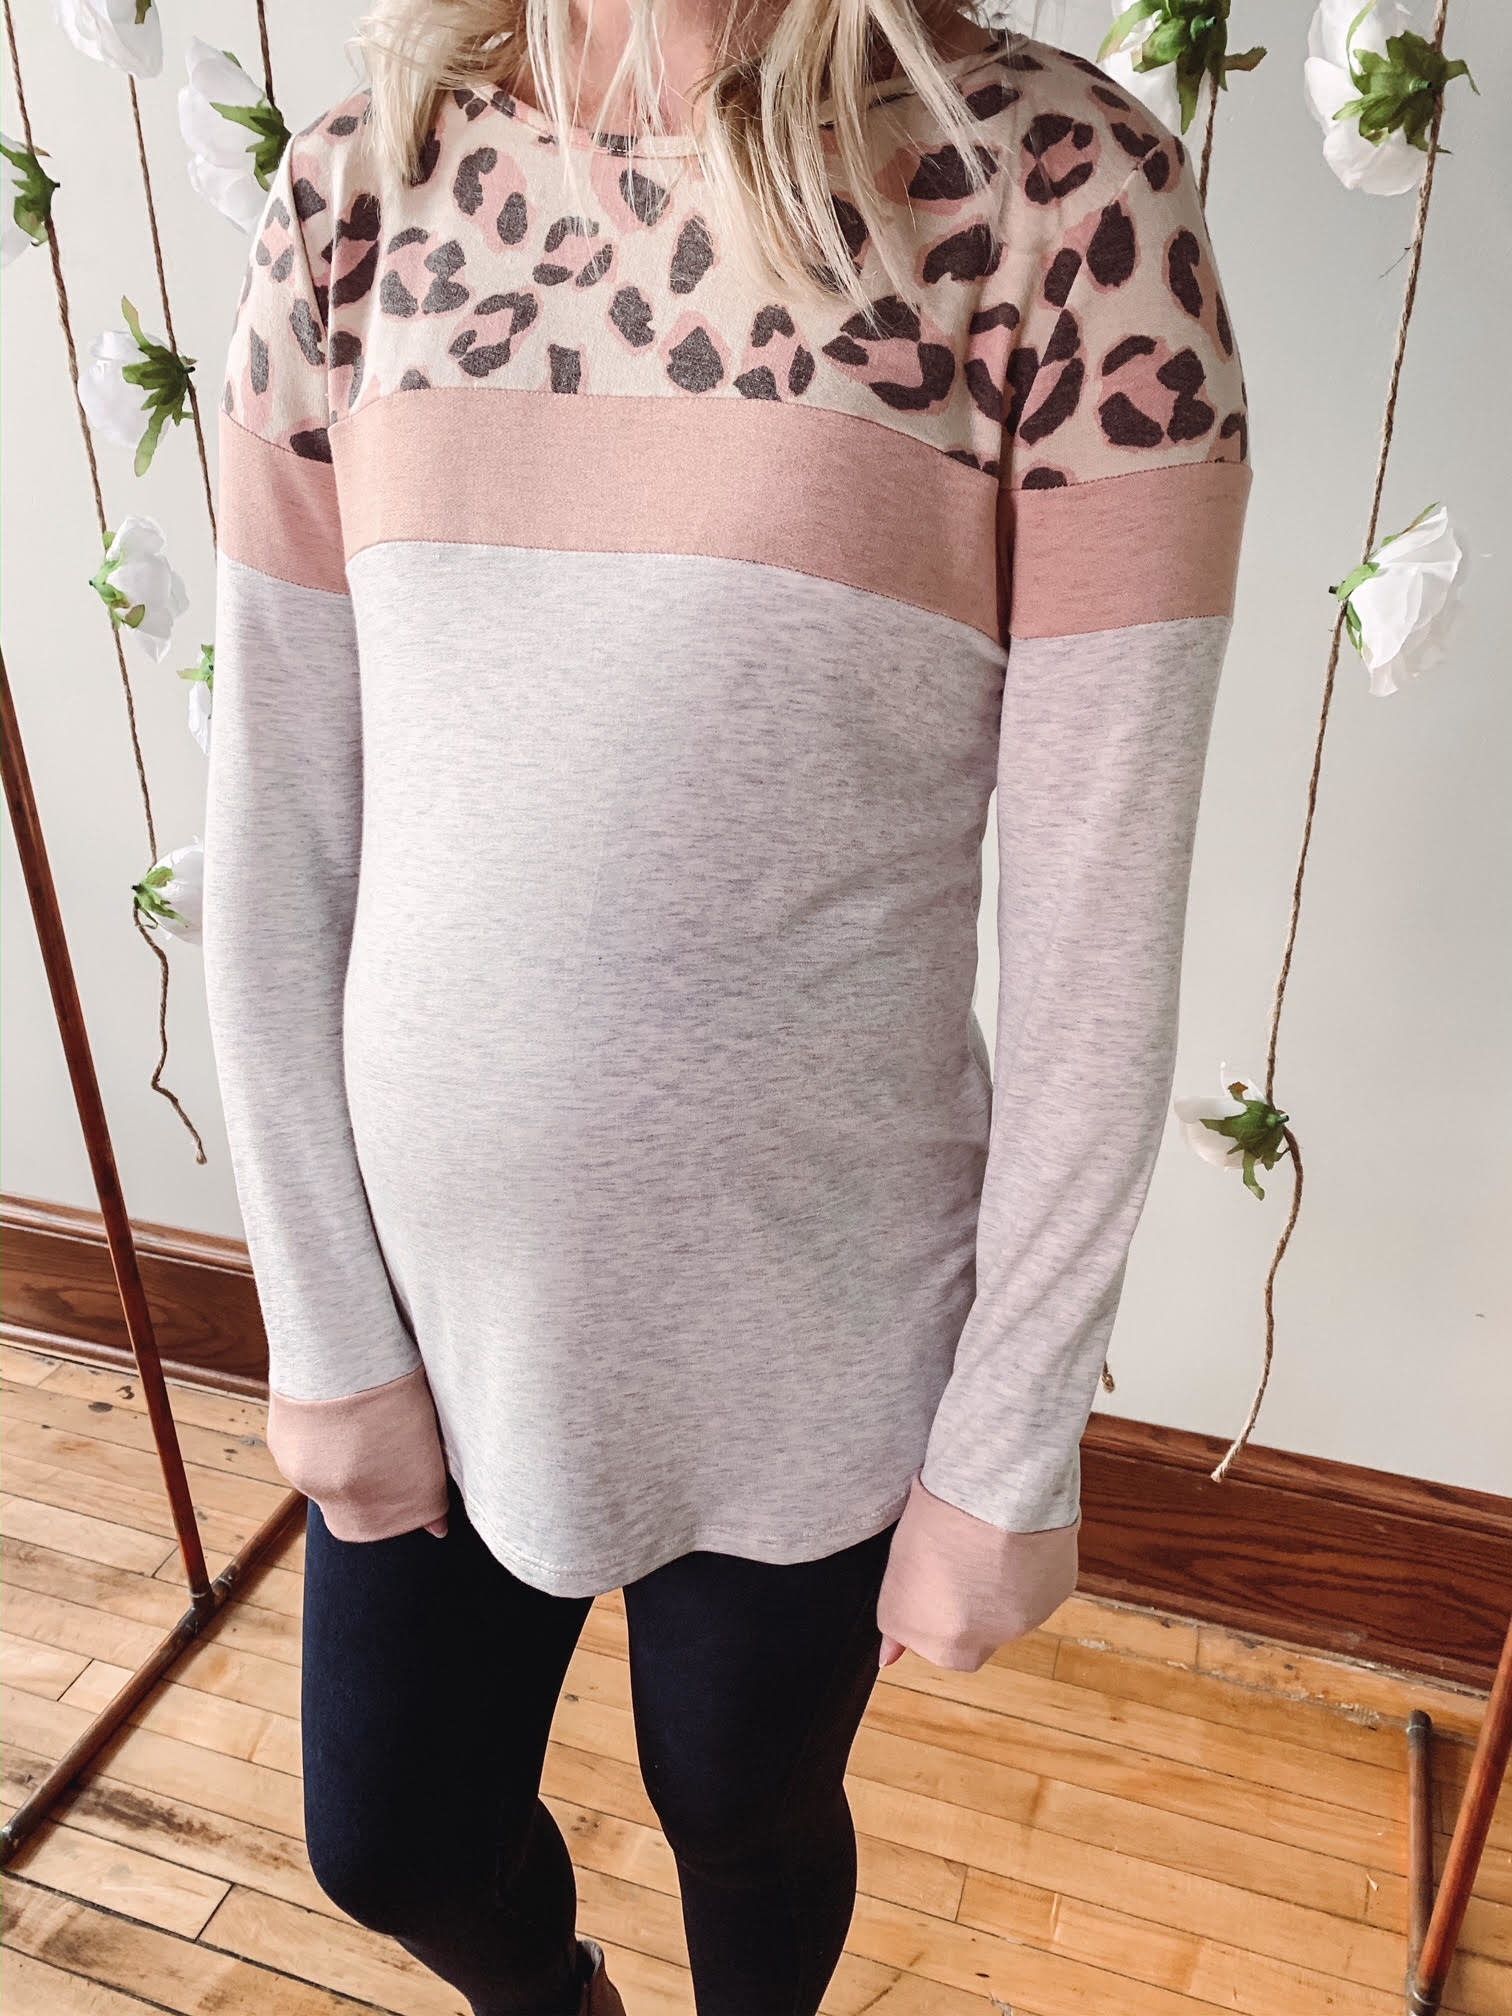 Liz Leopard Color Block Top